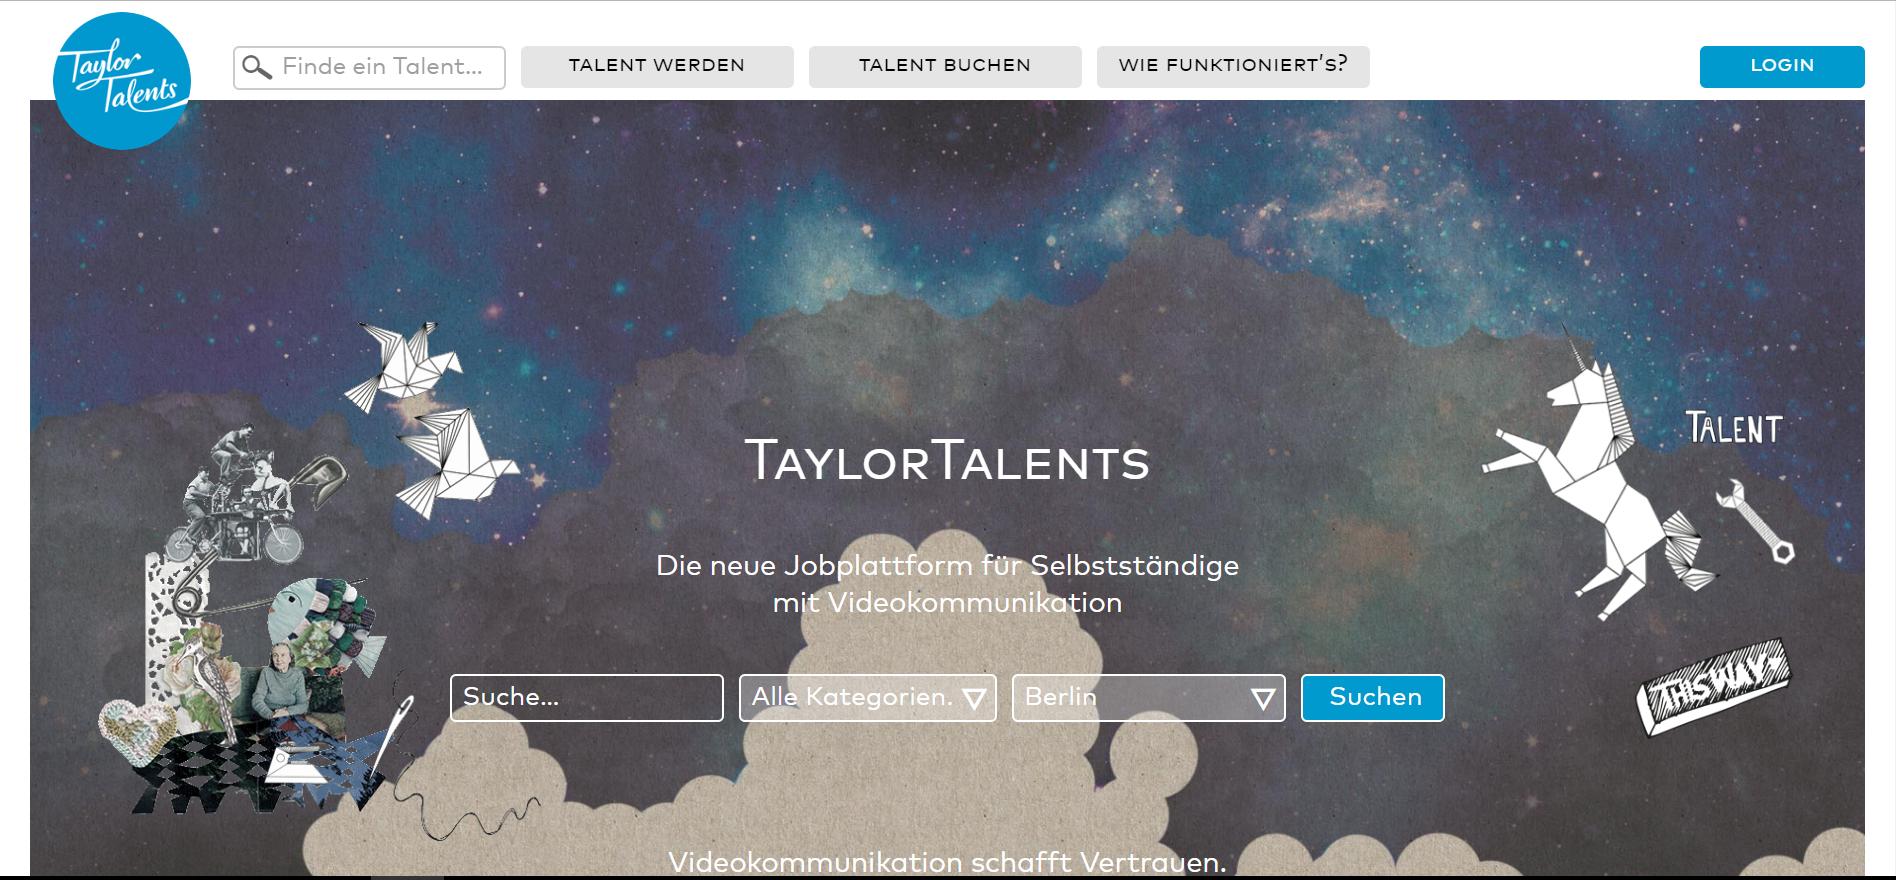 Taylor Talents